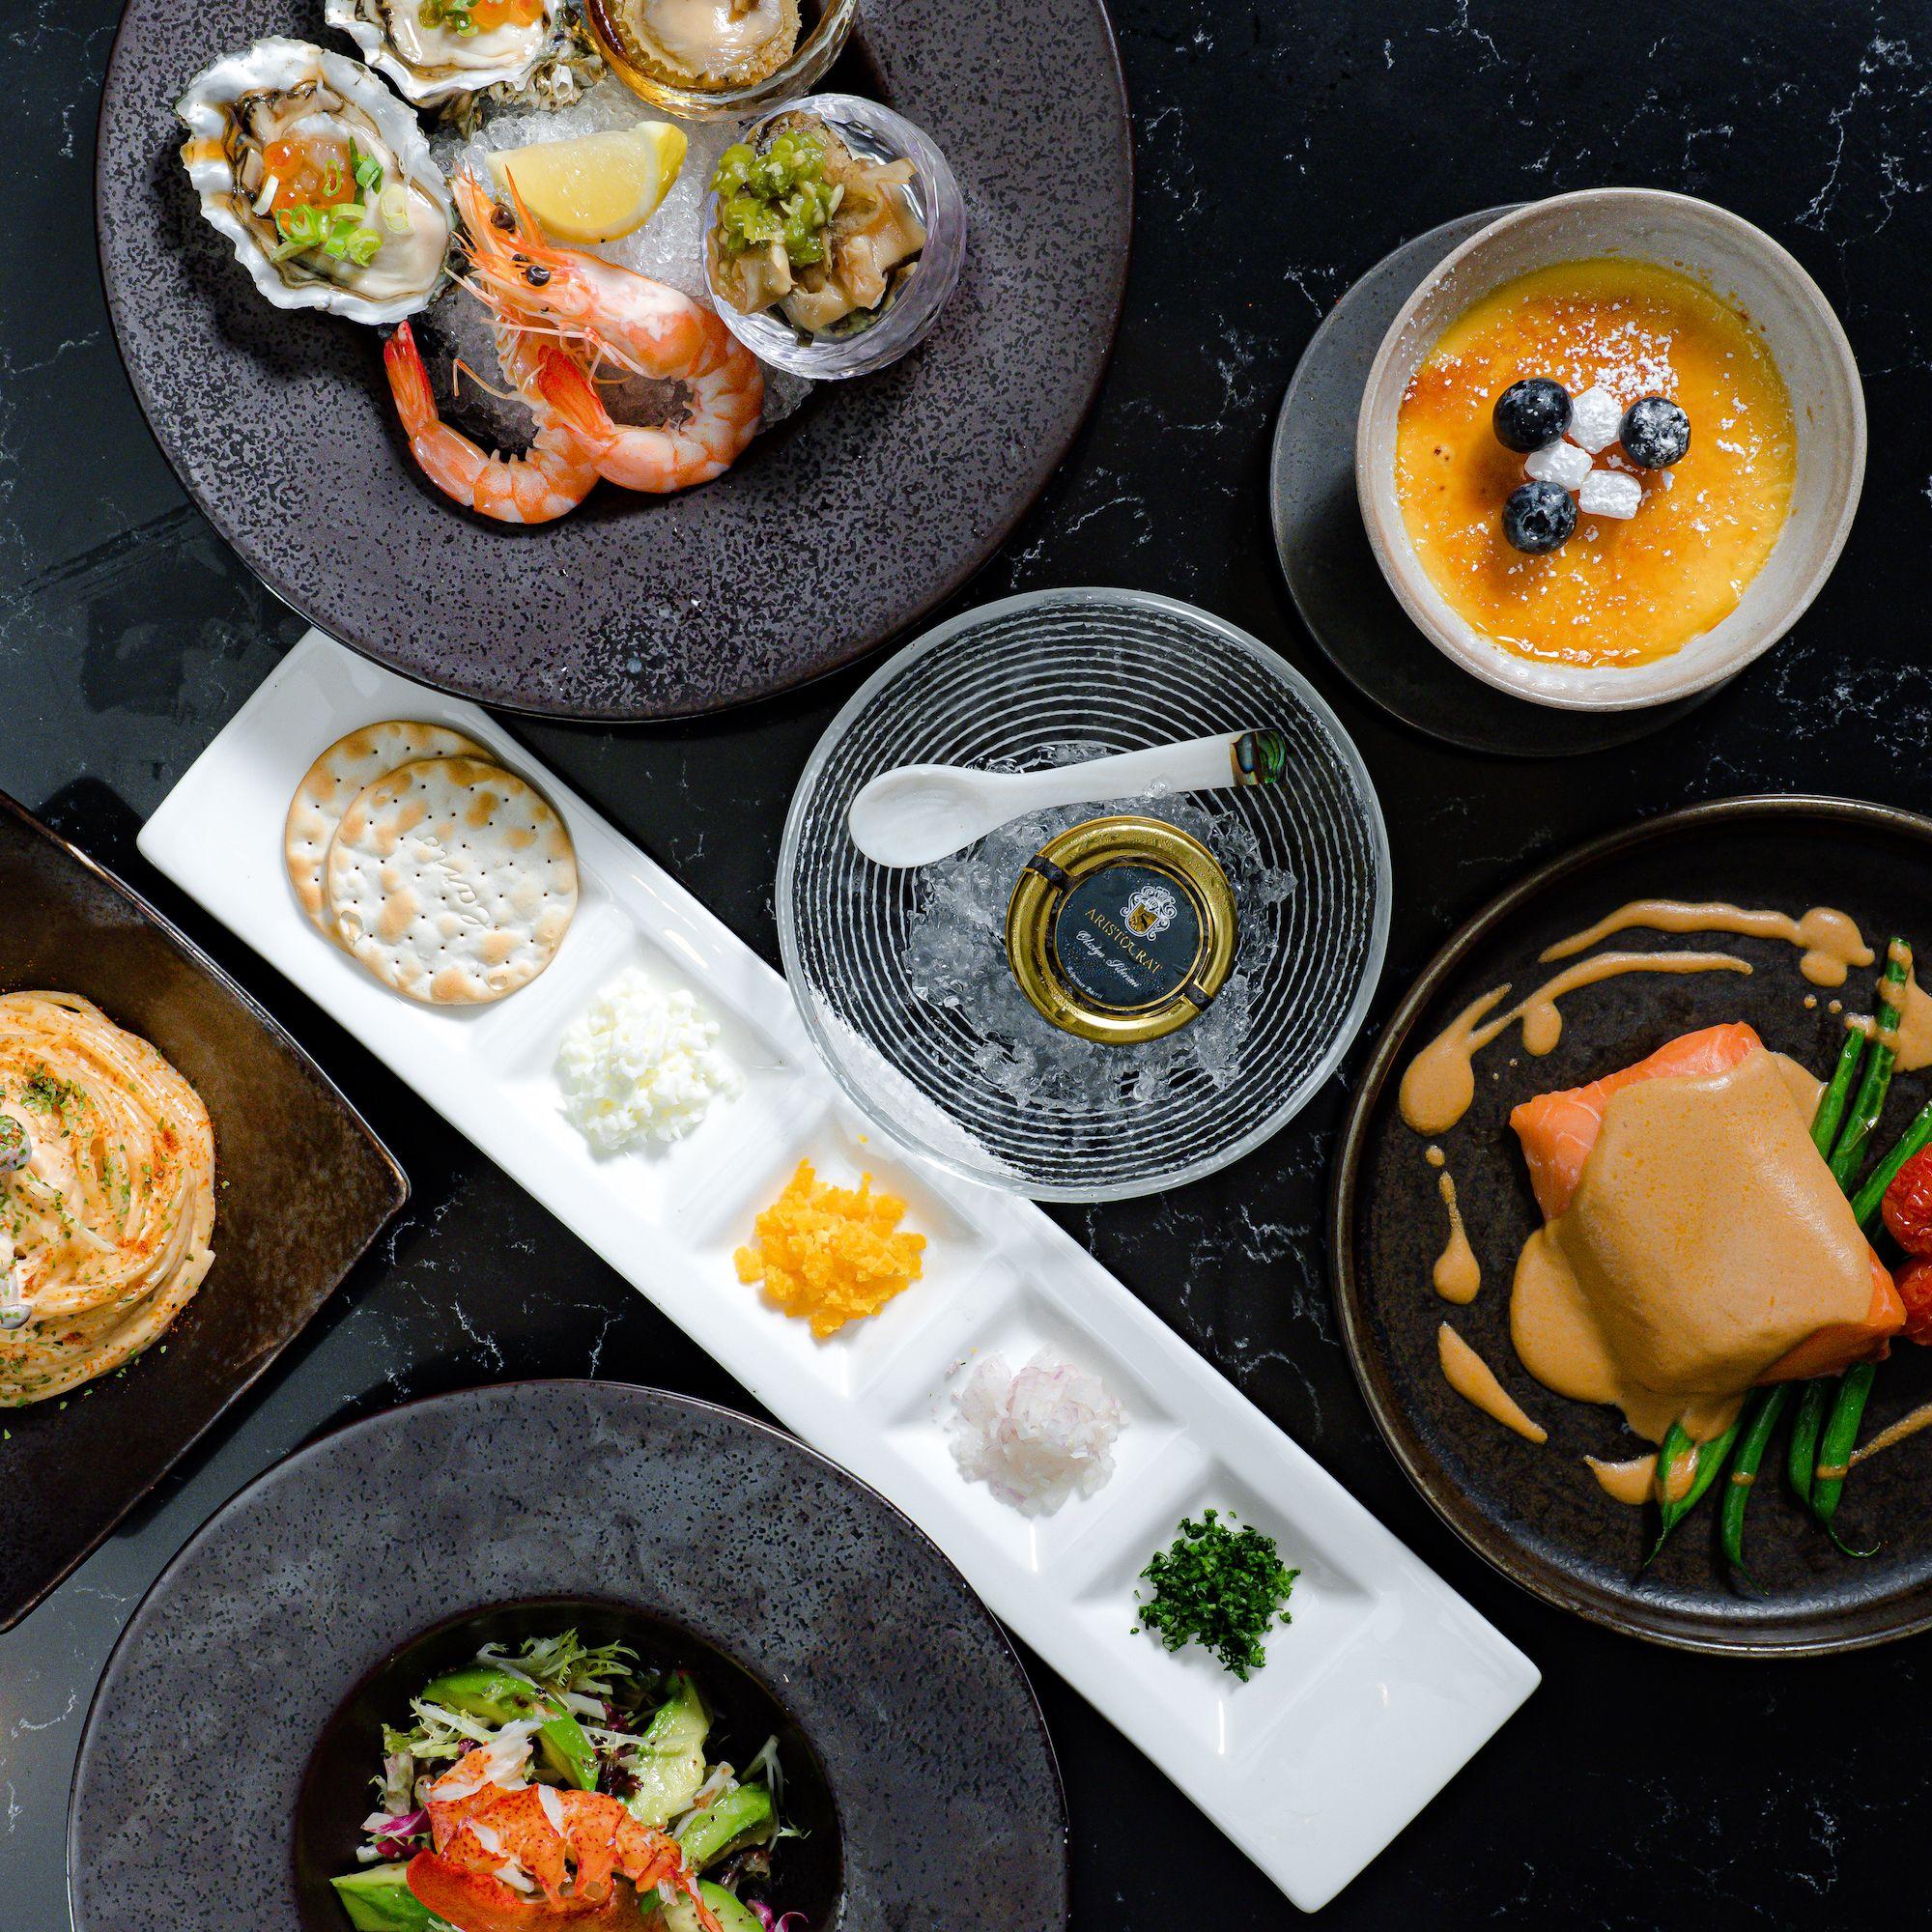 Hong Kong Restaurant News: Oktoberfest at Basehall, Free-Flow Brunch at Zeng and More